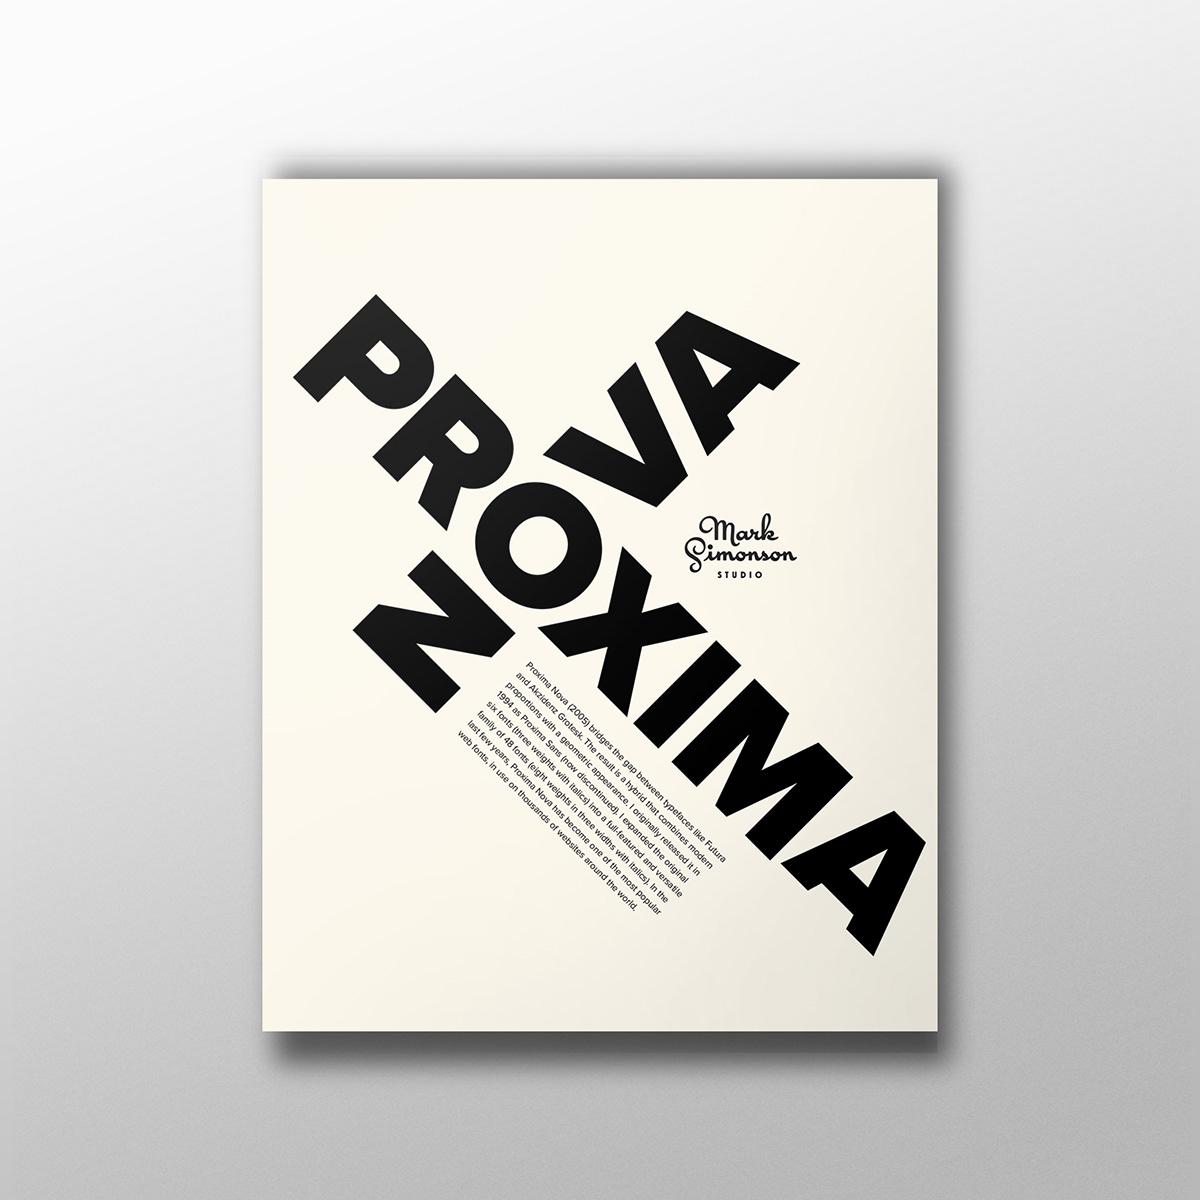 Proxima Nova Typography Poster On Student Show